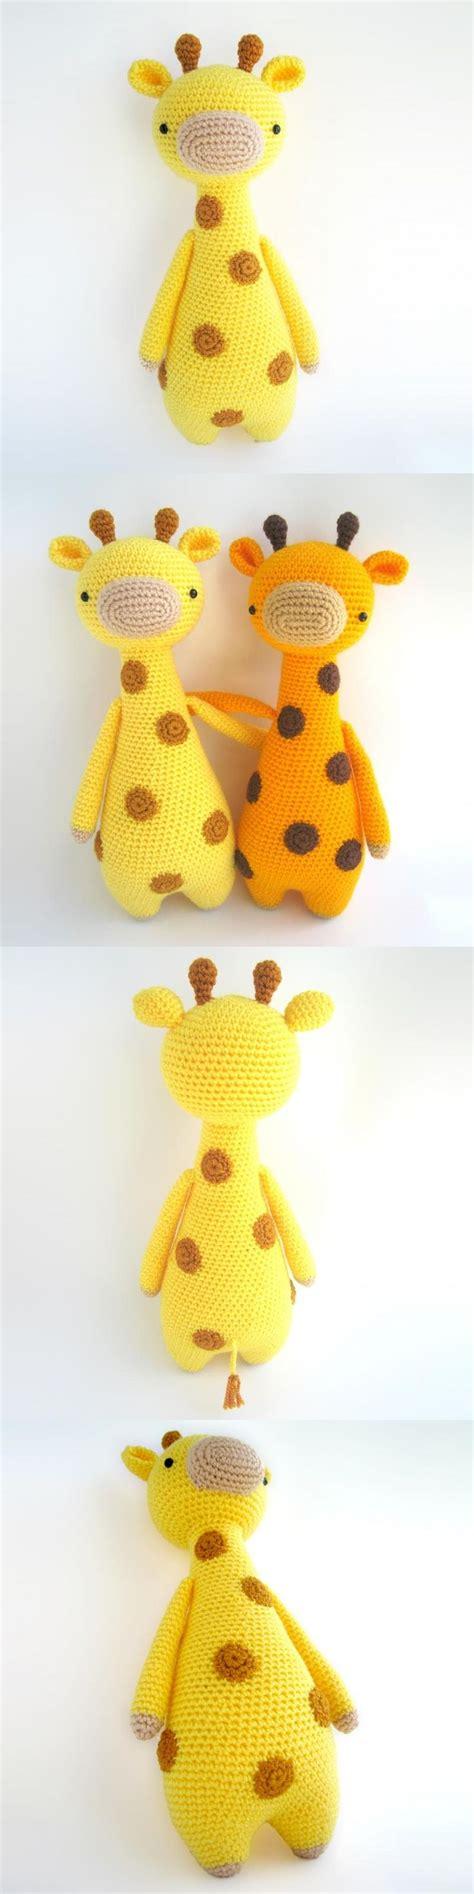 sentence pattern for i saw a tall giraffe best 25 crochet giraffe pattern ideas on pinterest diy